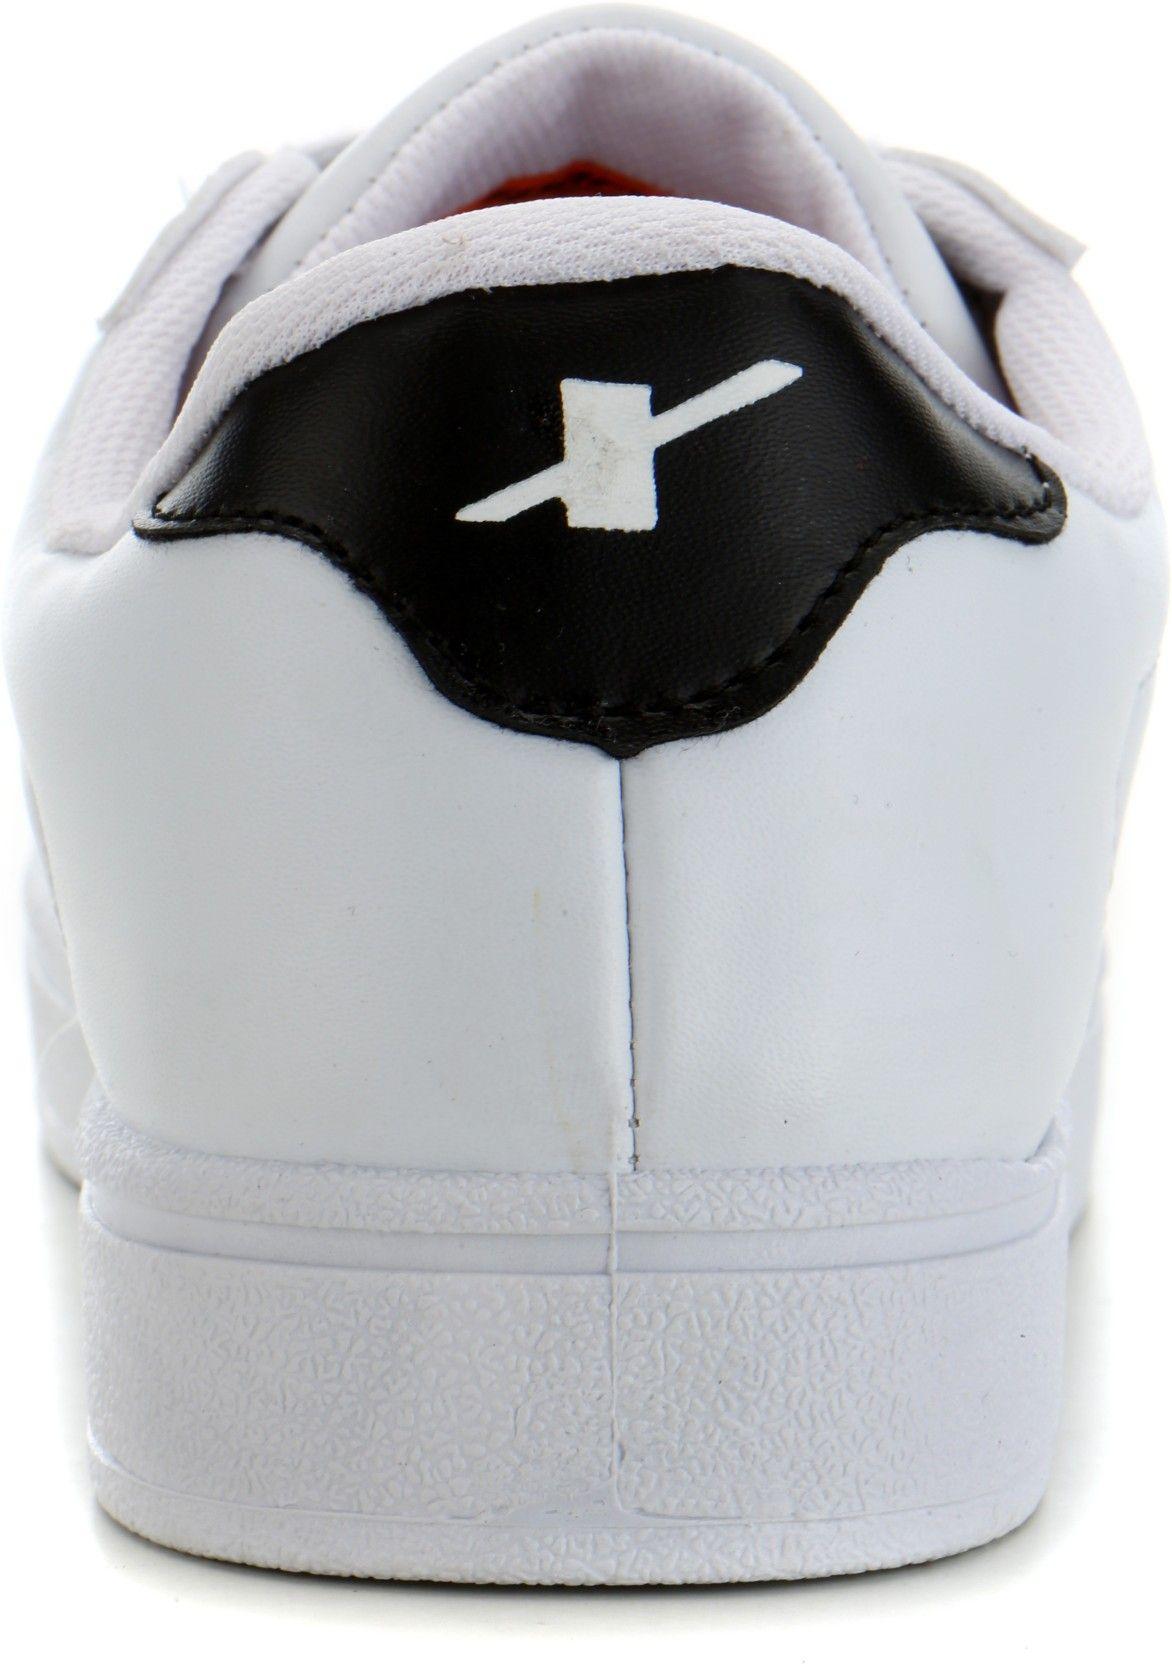 4.2/5) White Sparx Canvas Shoes For Men